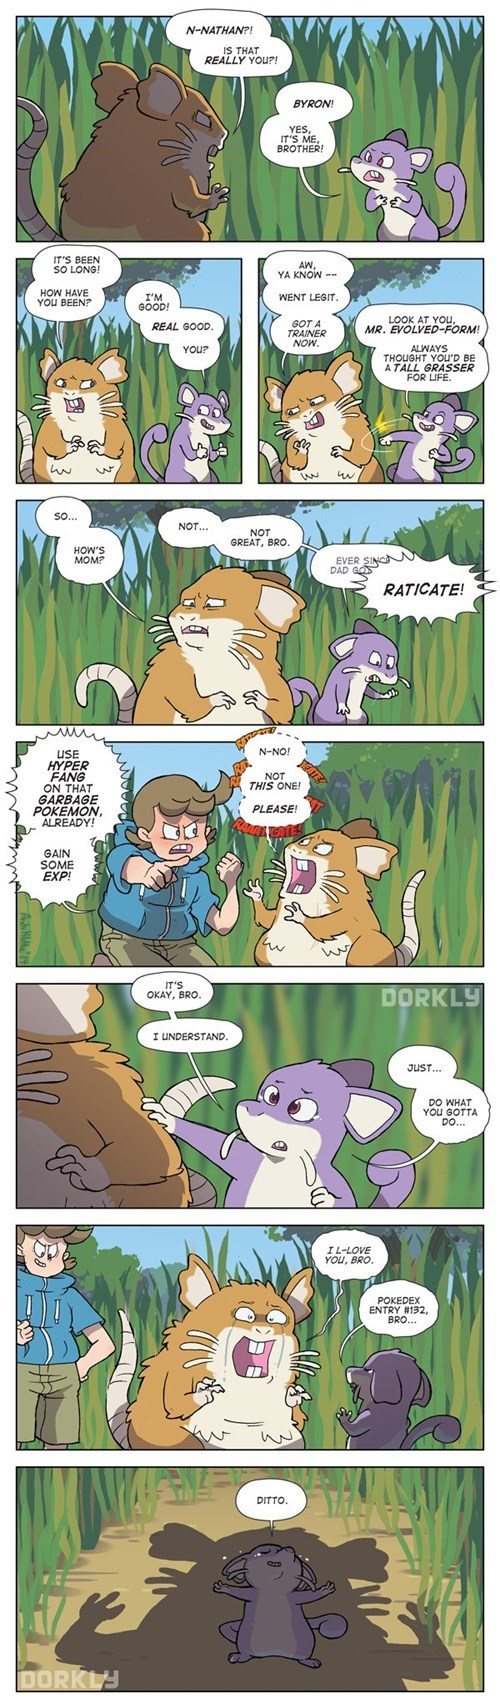 dorkly Pokémon rattata web comics